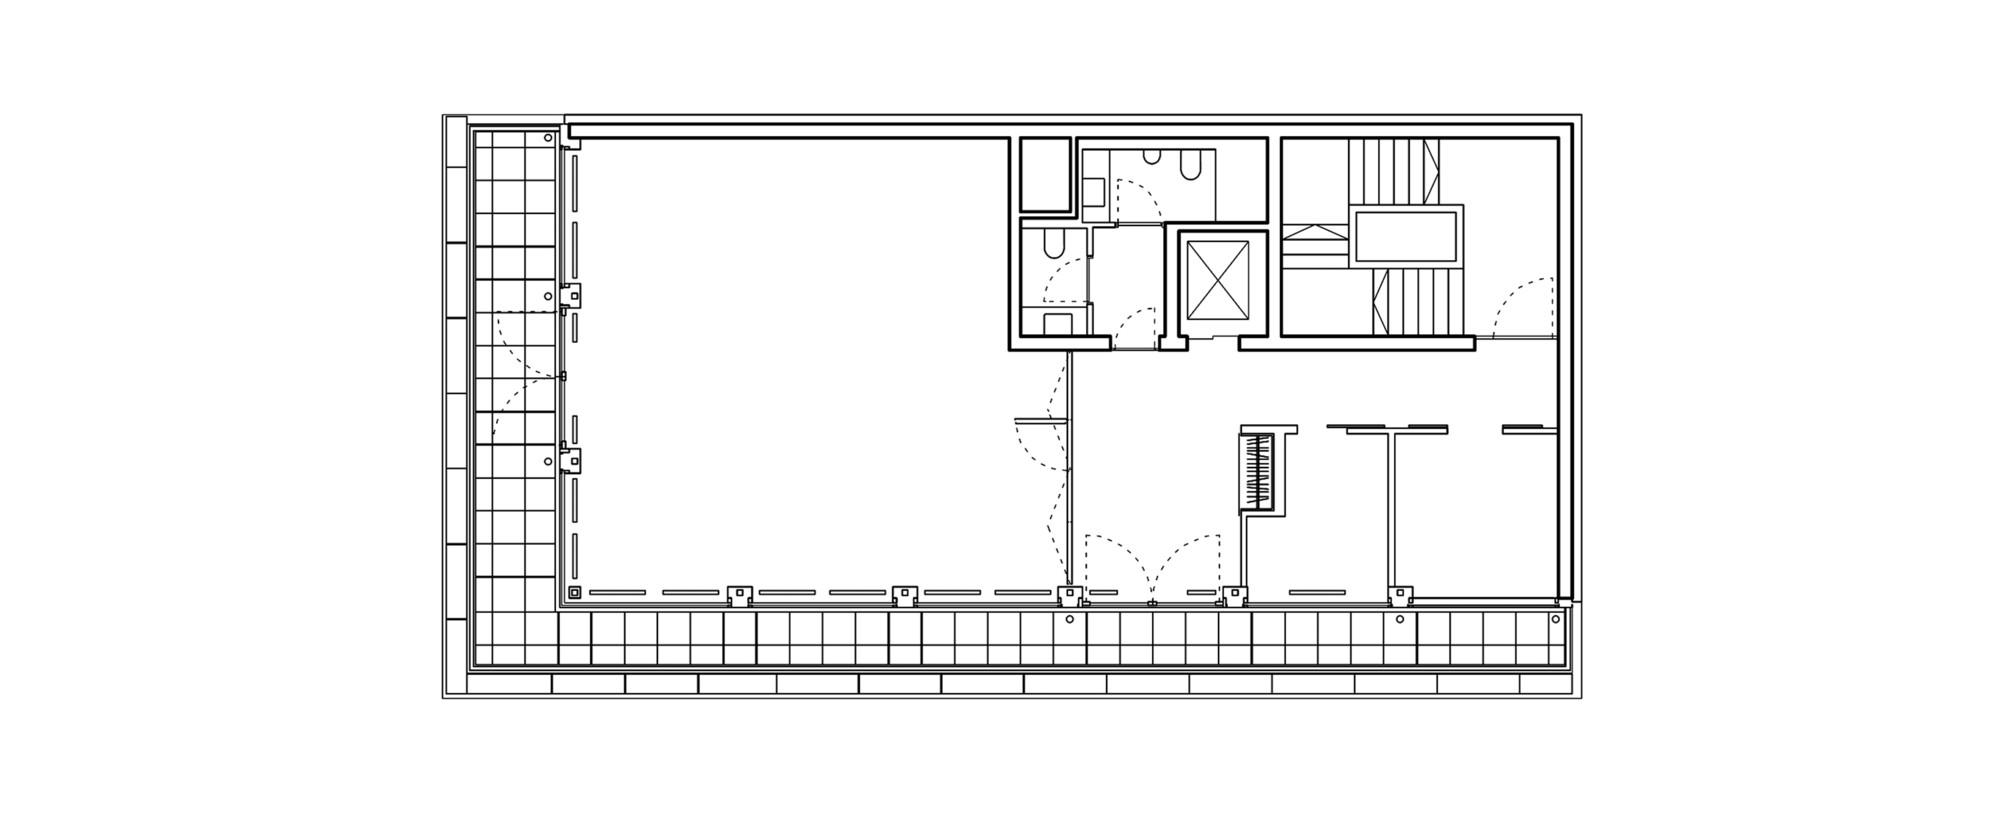 Psd bank office buildingthird floor plan